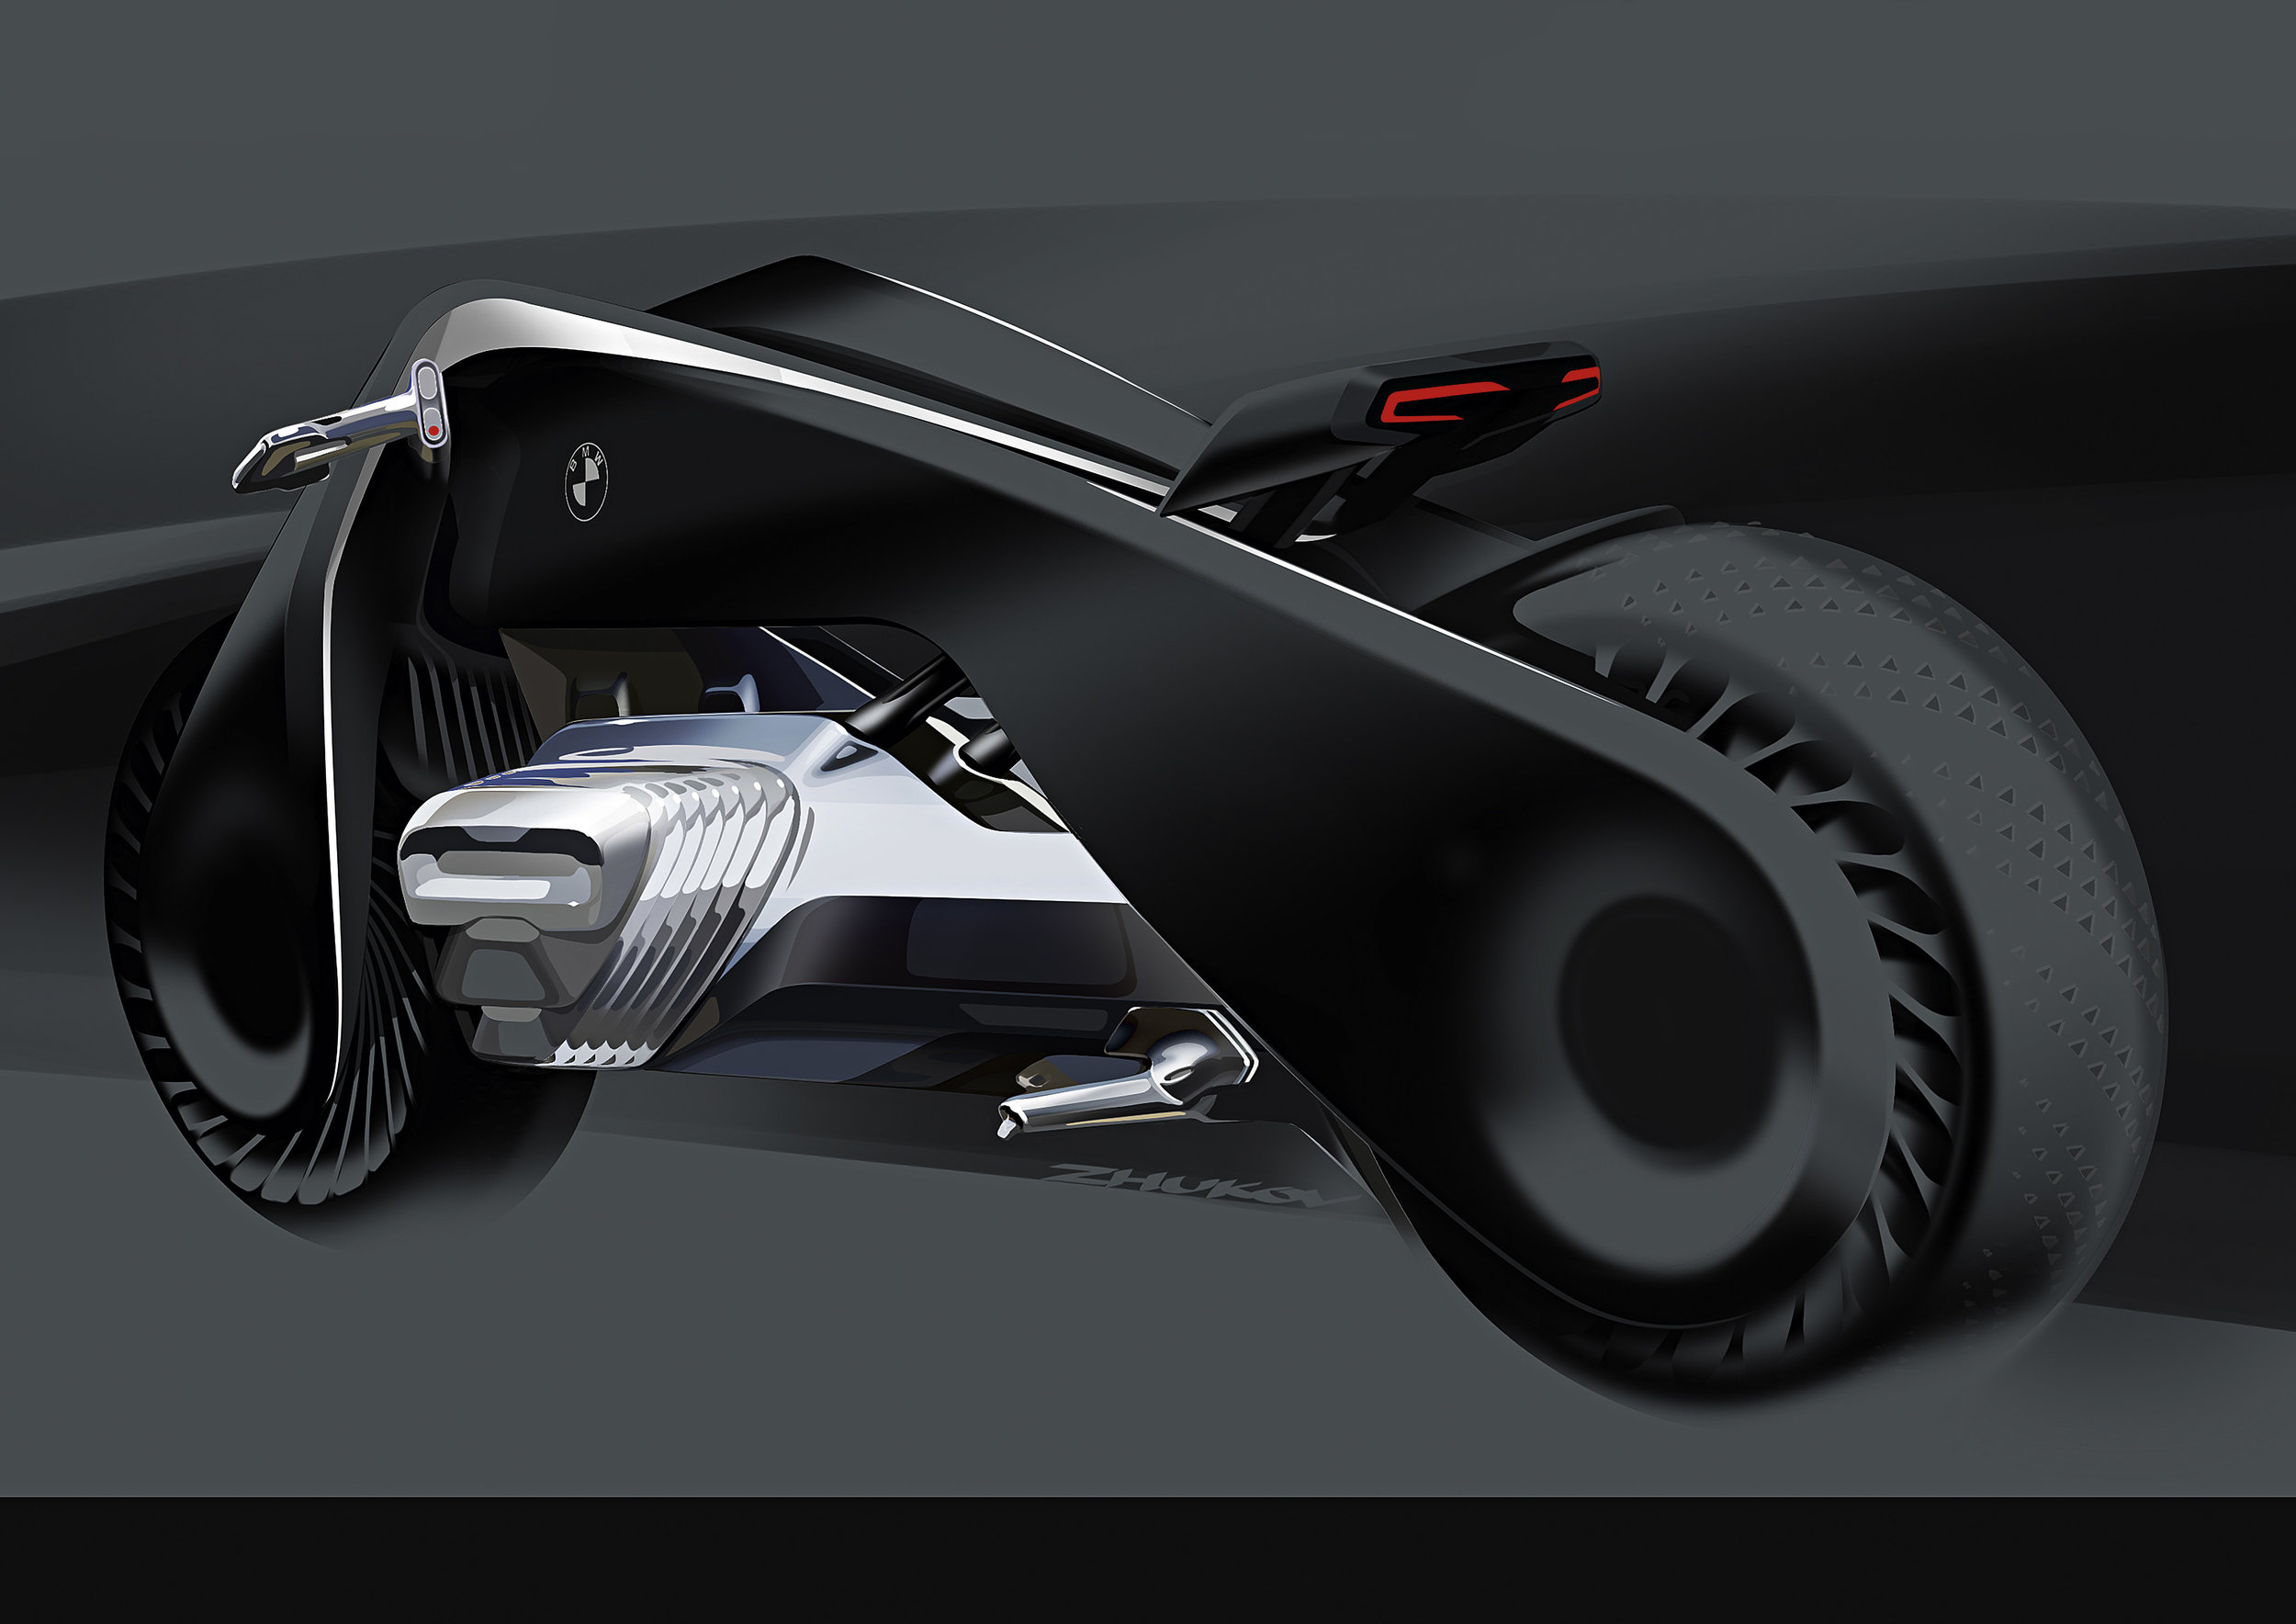 P90238736_highRes_sketch-bmw-motorrad-.jpg